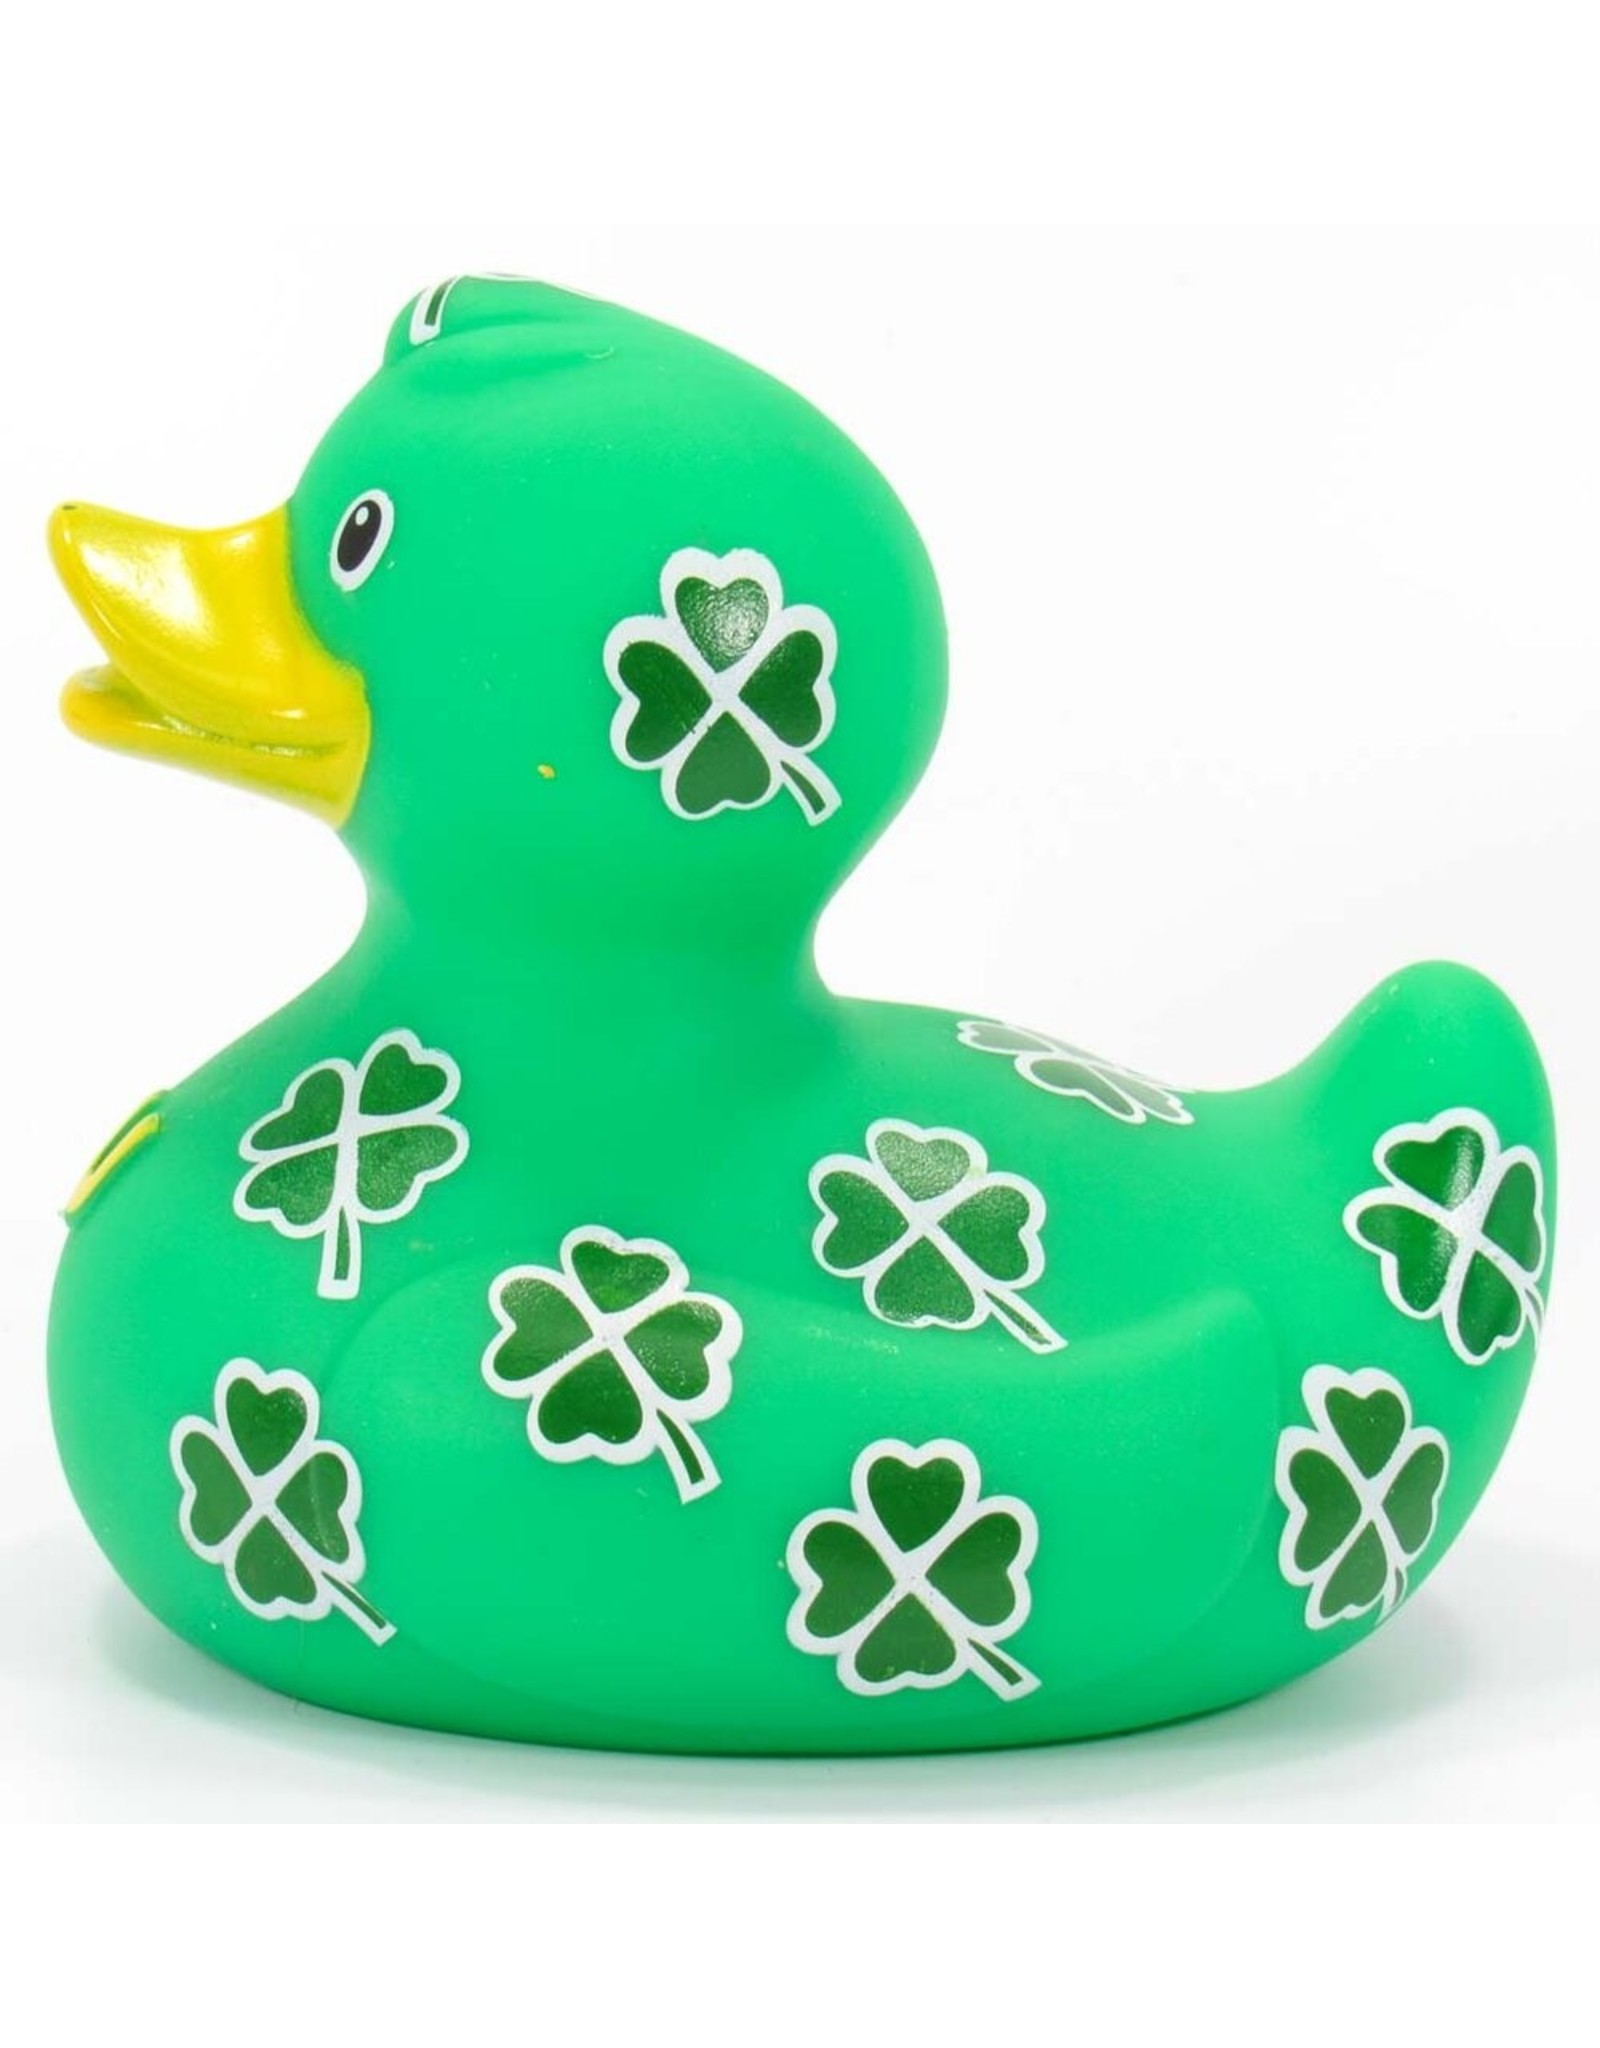 Clover Patch Rubber Duck